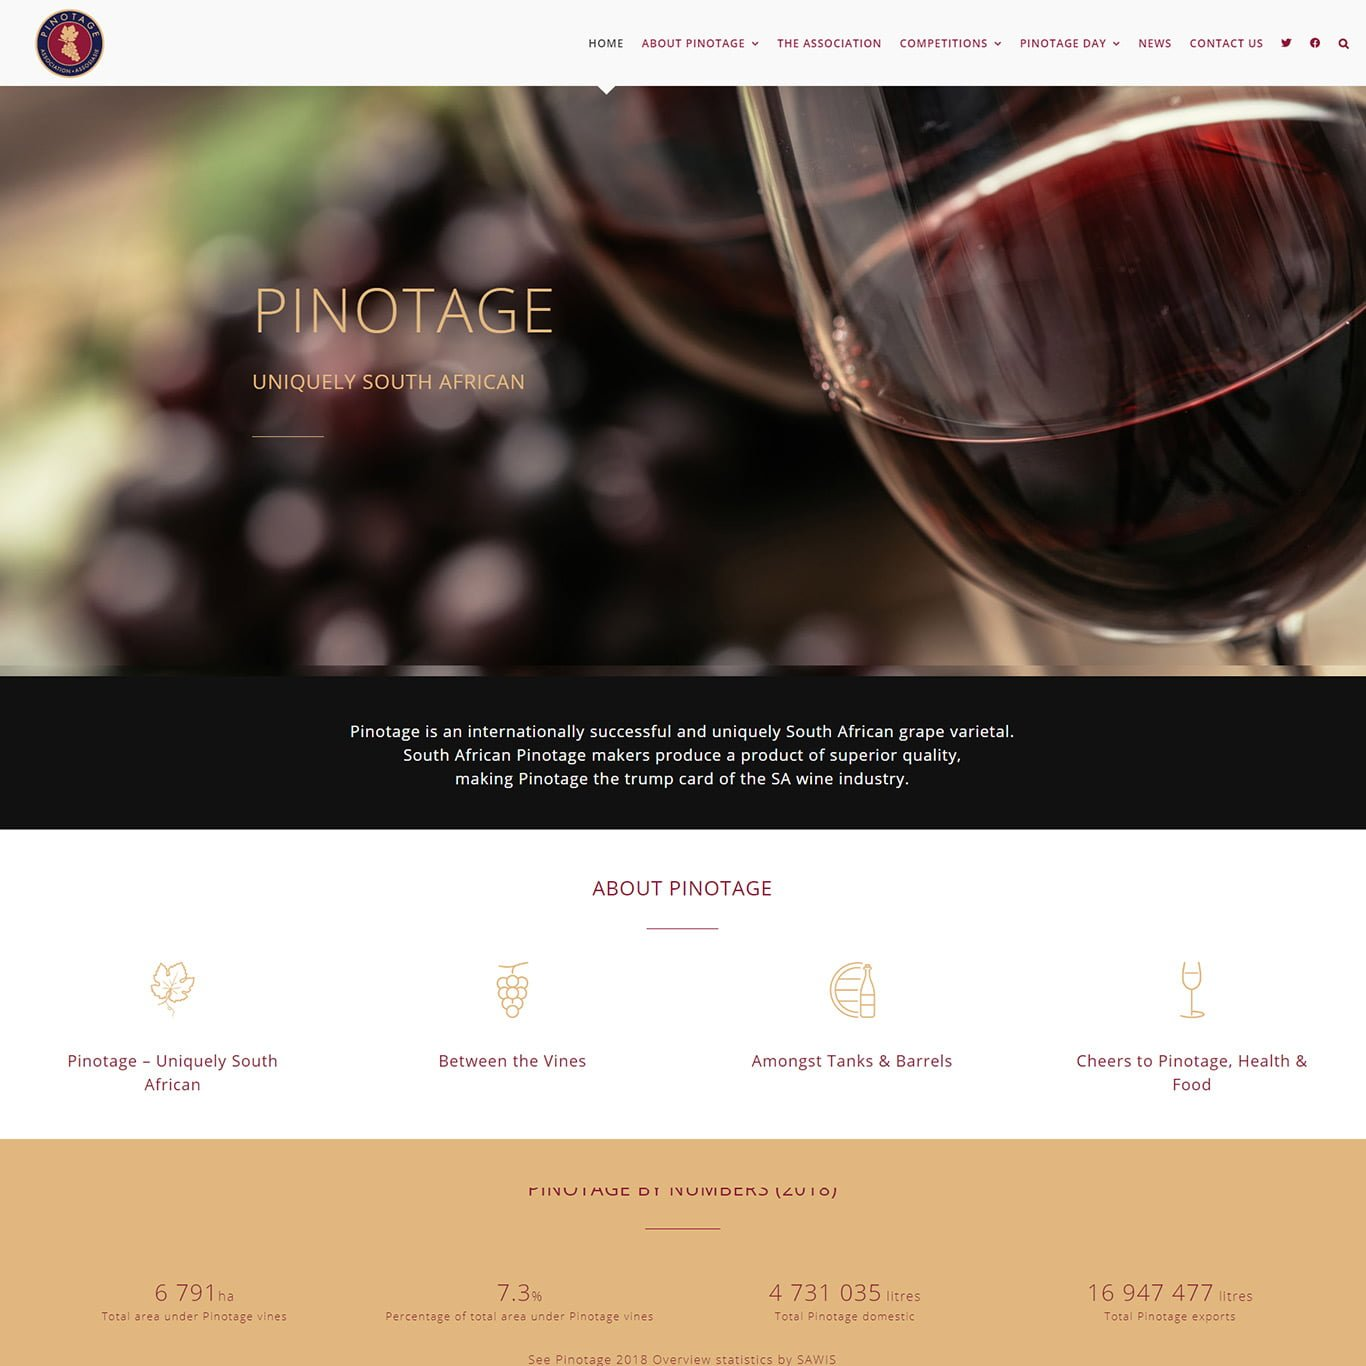 Pinotage Association